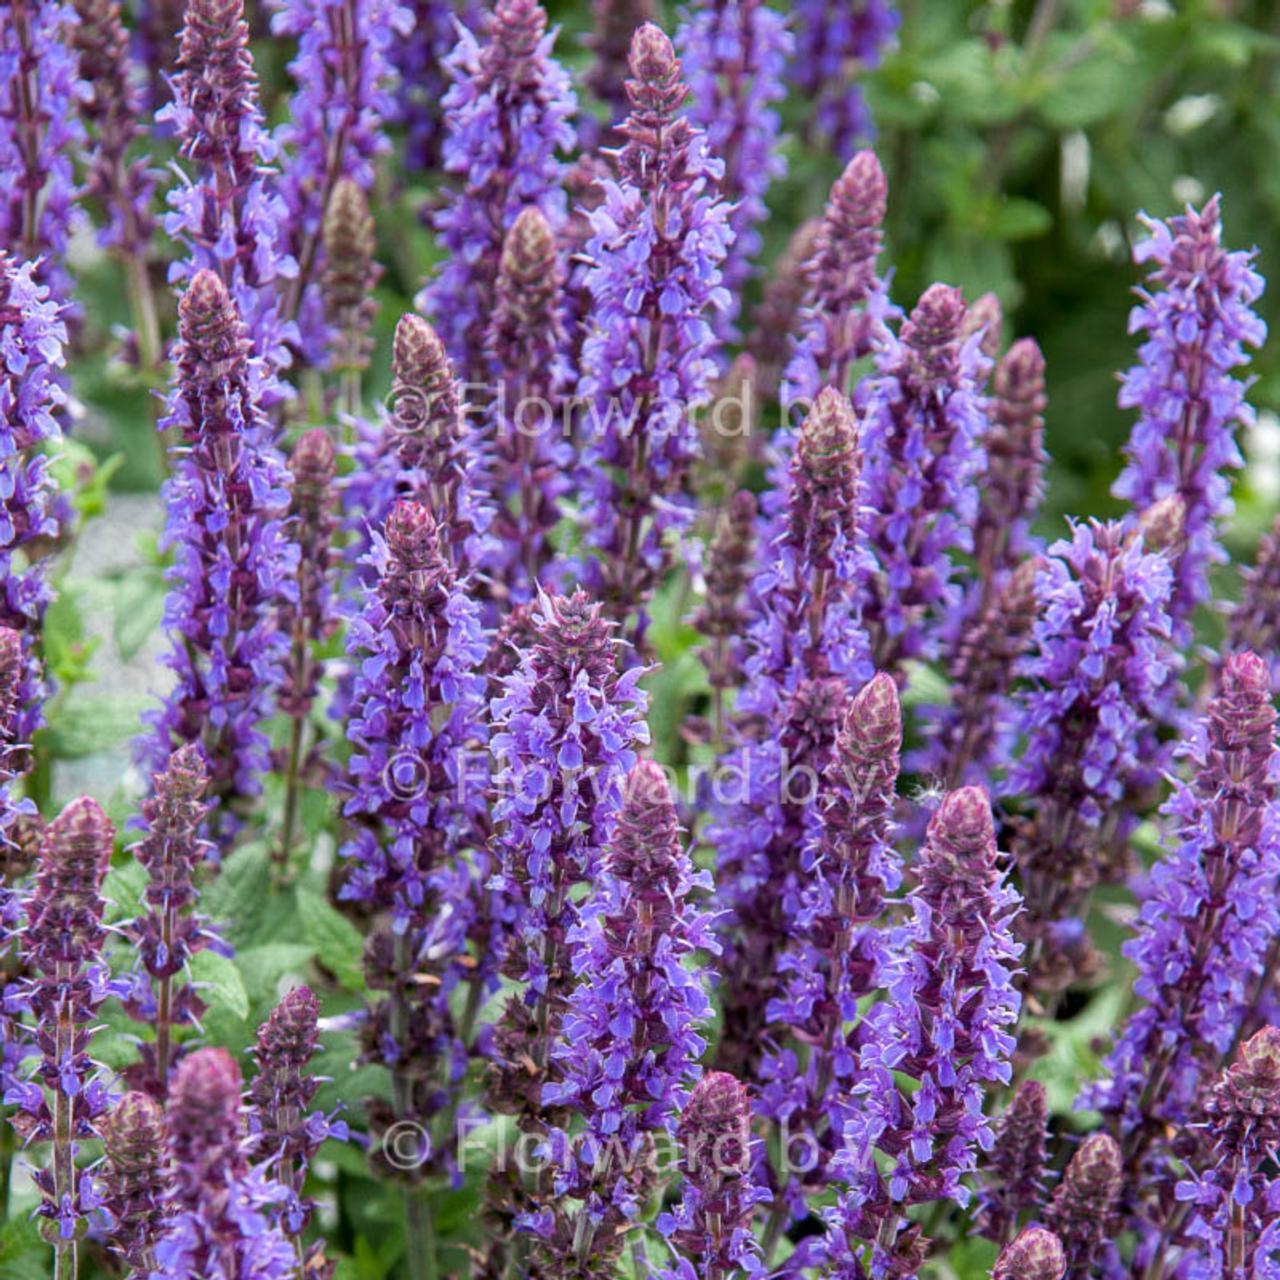 Salvia nemorosa 'Sensation Deep Blue' plant